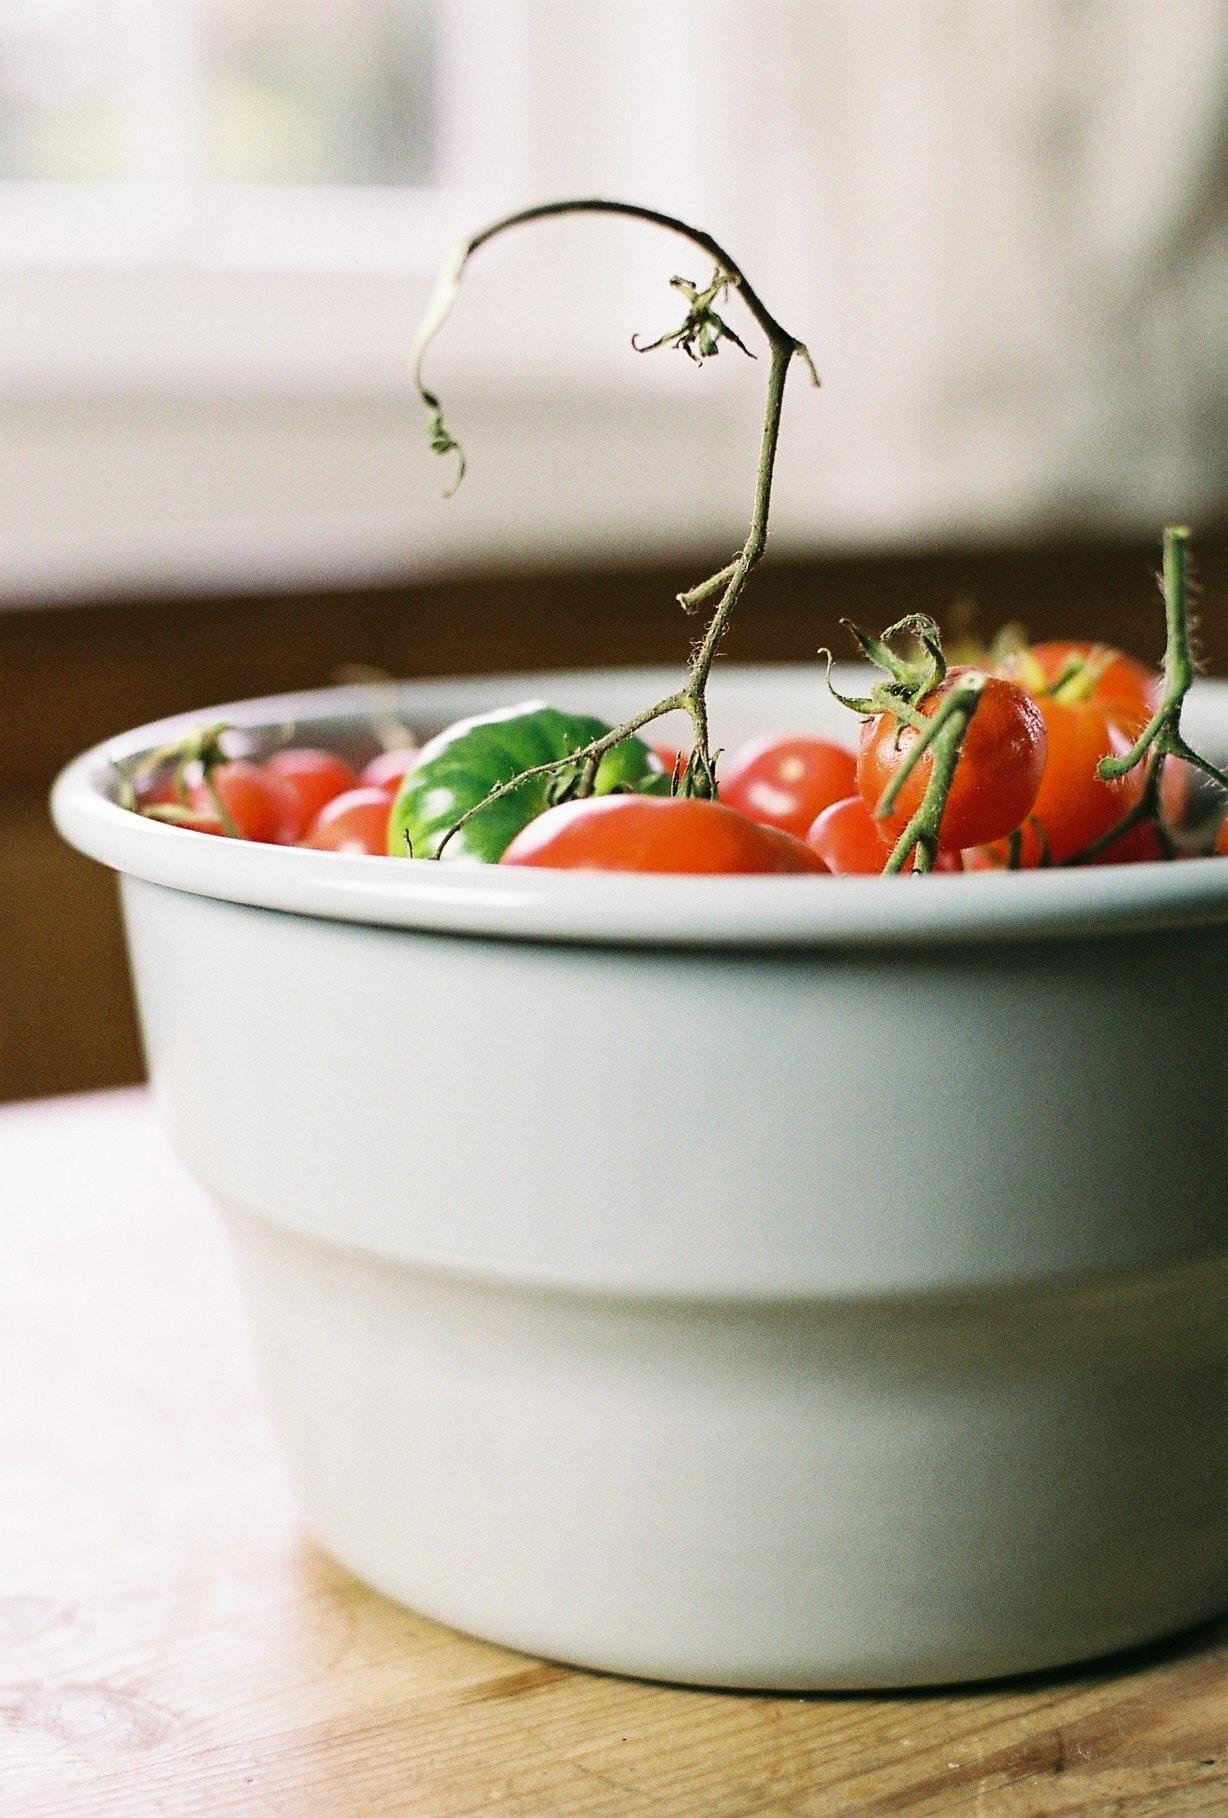 Turner & Harper Enamel Bowl with Tomatoes.jpg